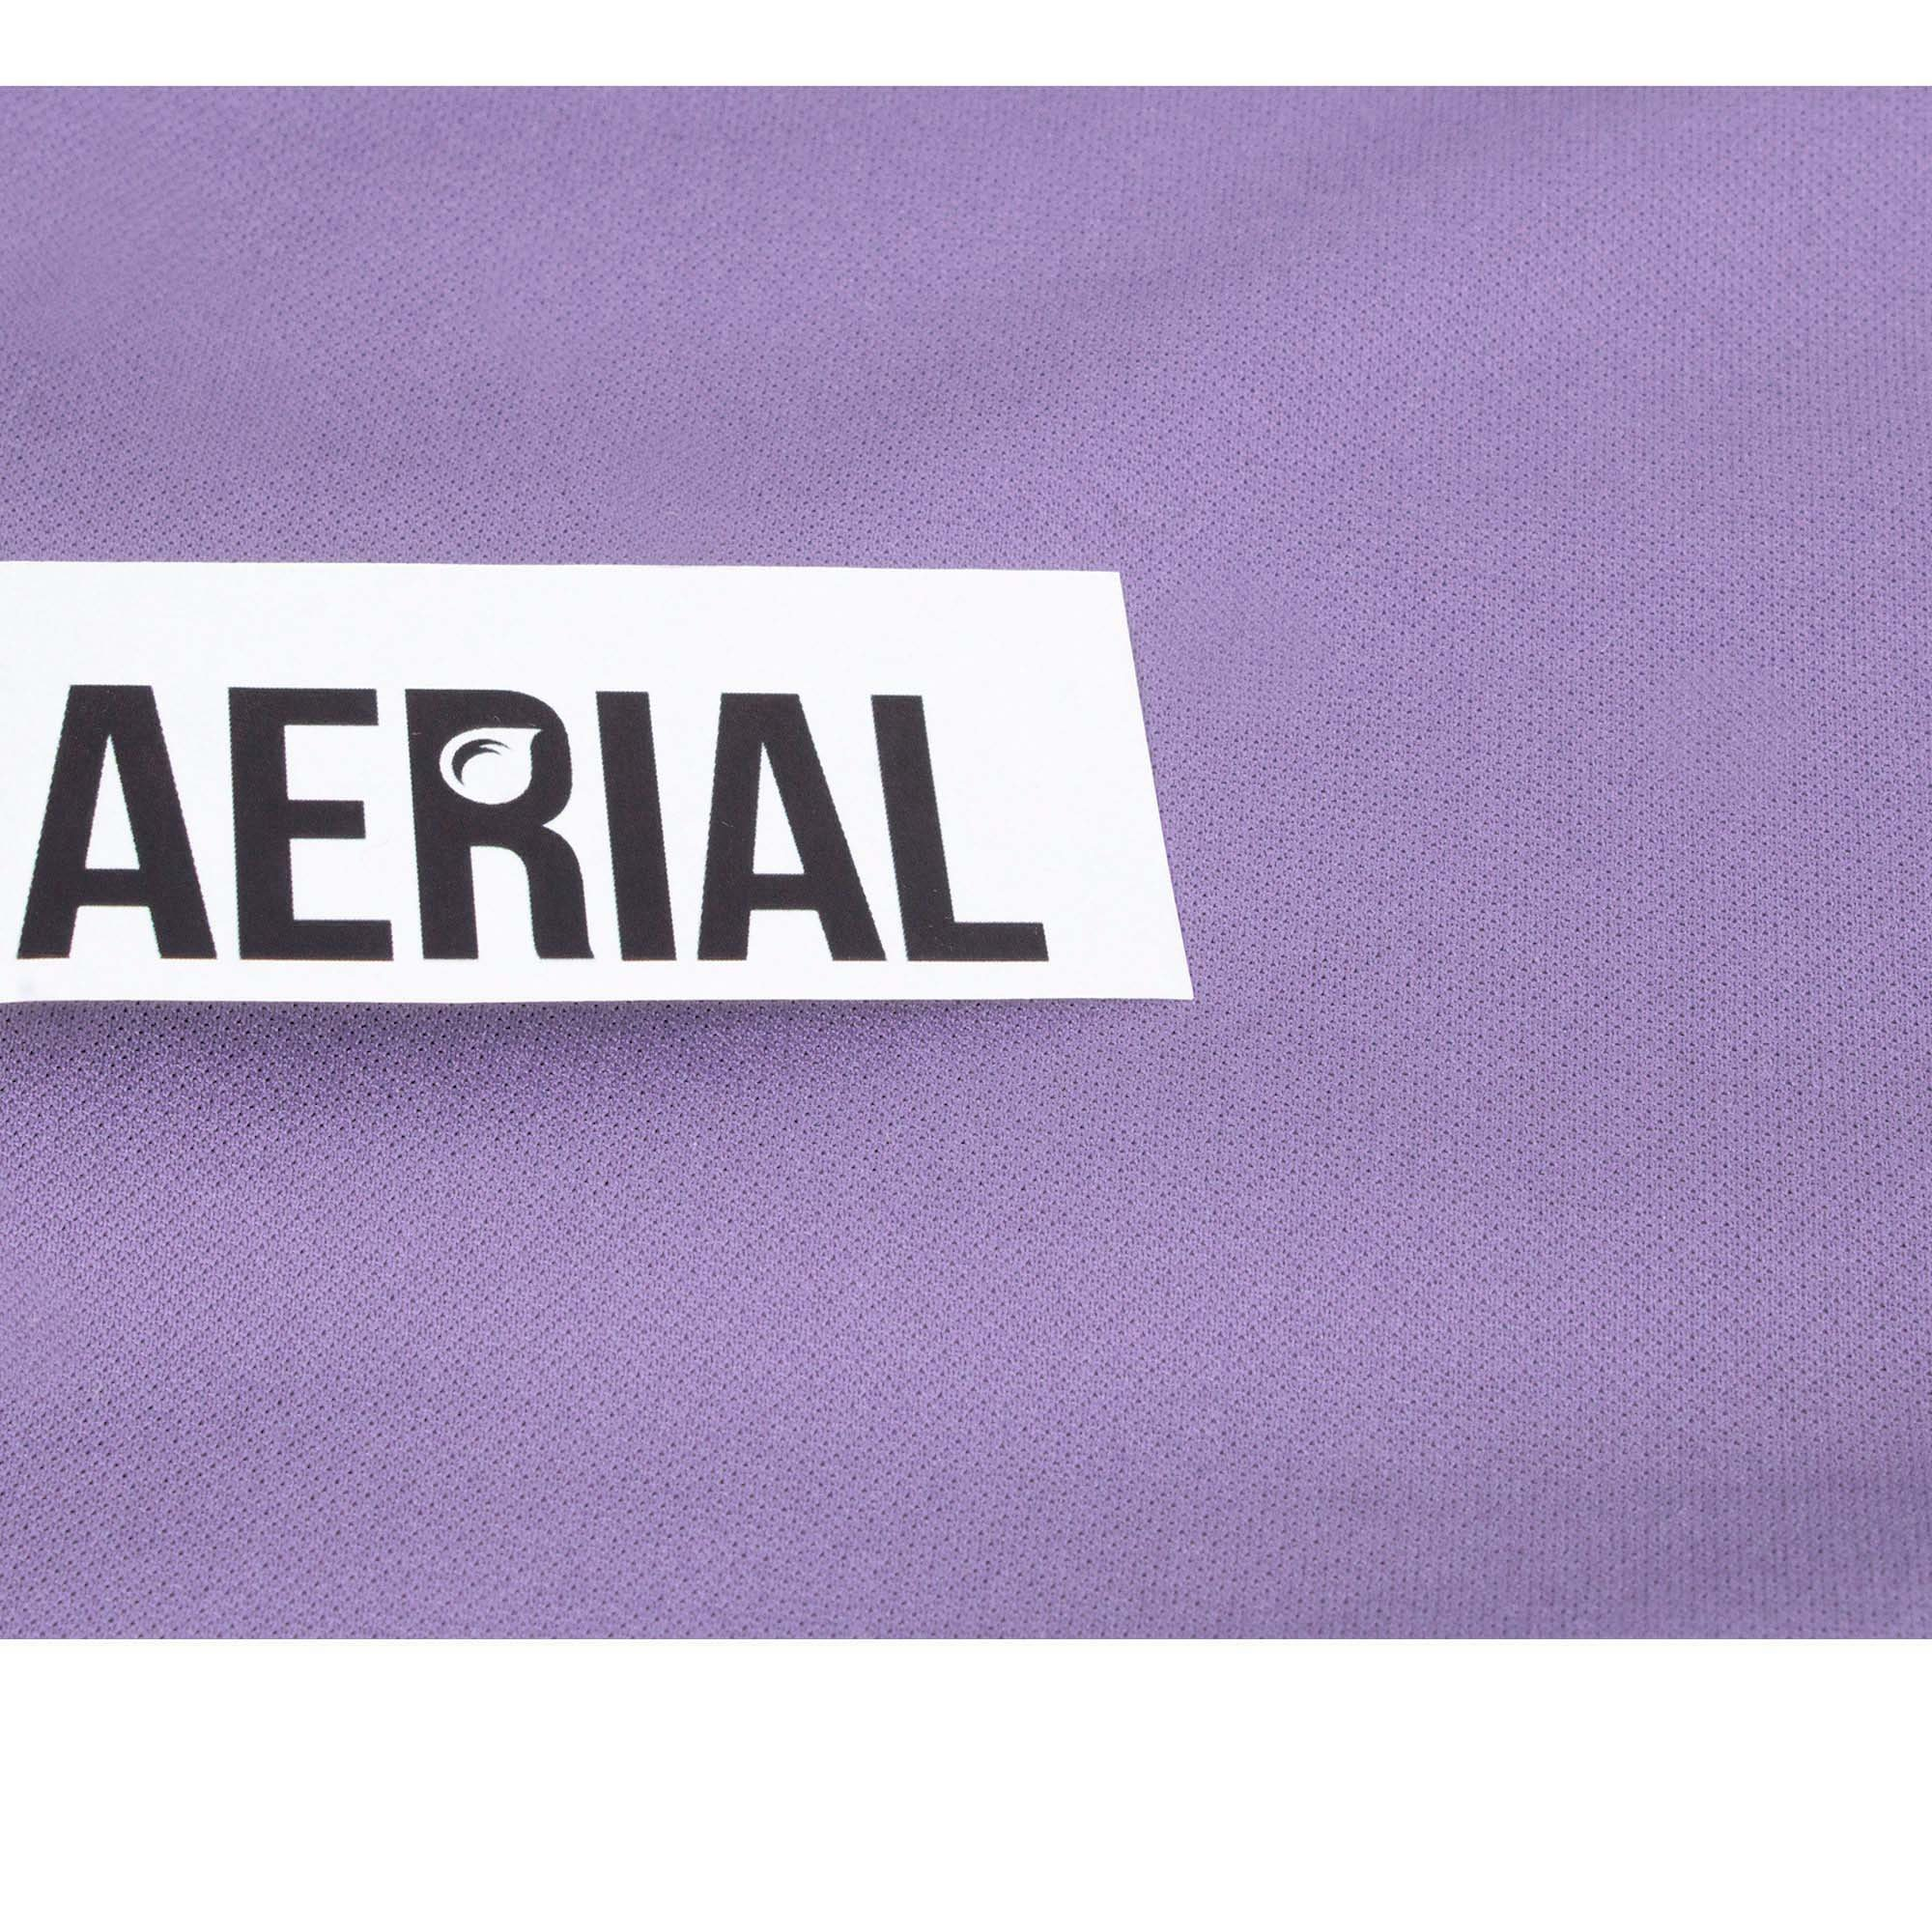 Firetoys Professional Aerial Silks Fabric/Tissues, Medium Stretch Silk WLL 282lbs (128kg) (Lavender, 32' (10m)) by Firetoys (Image #2)